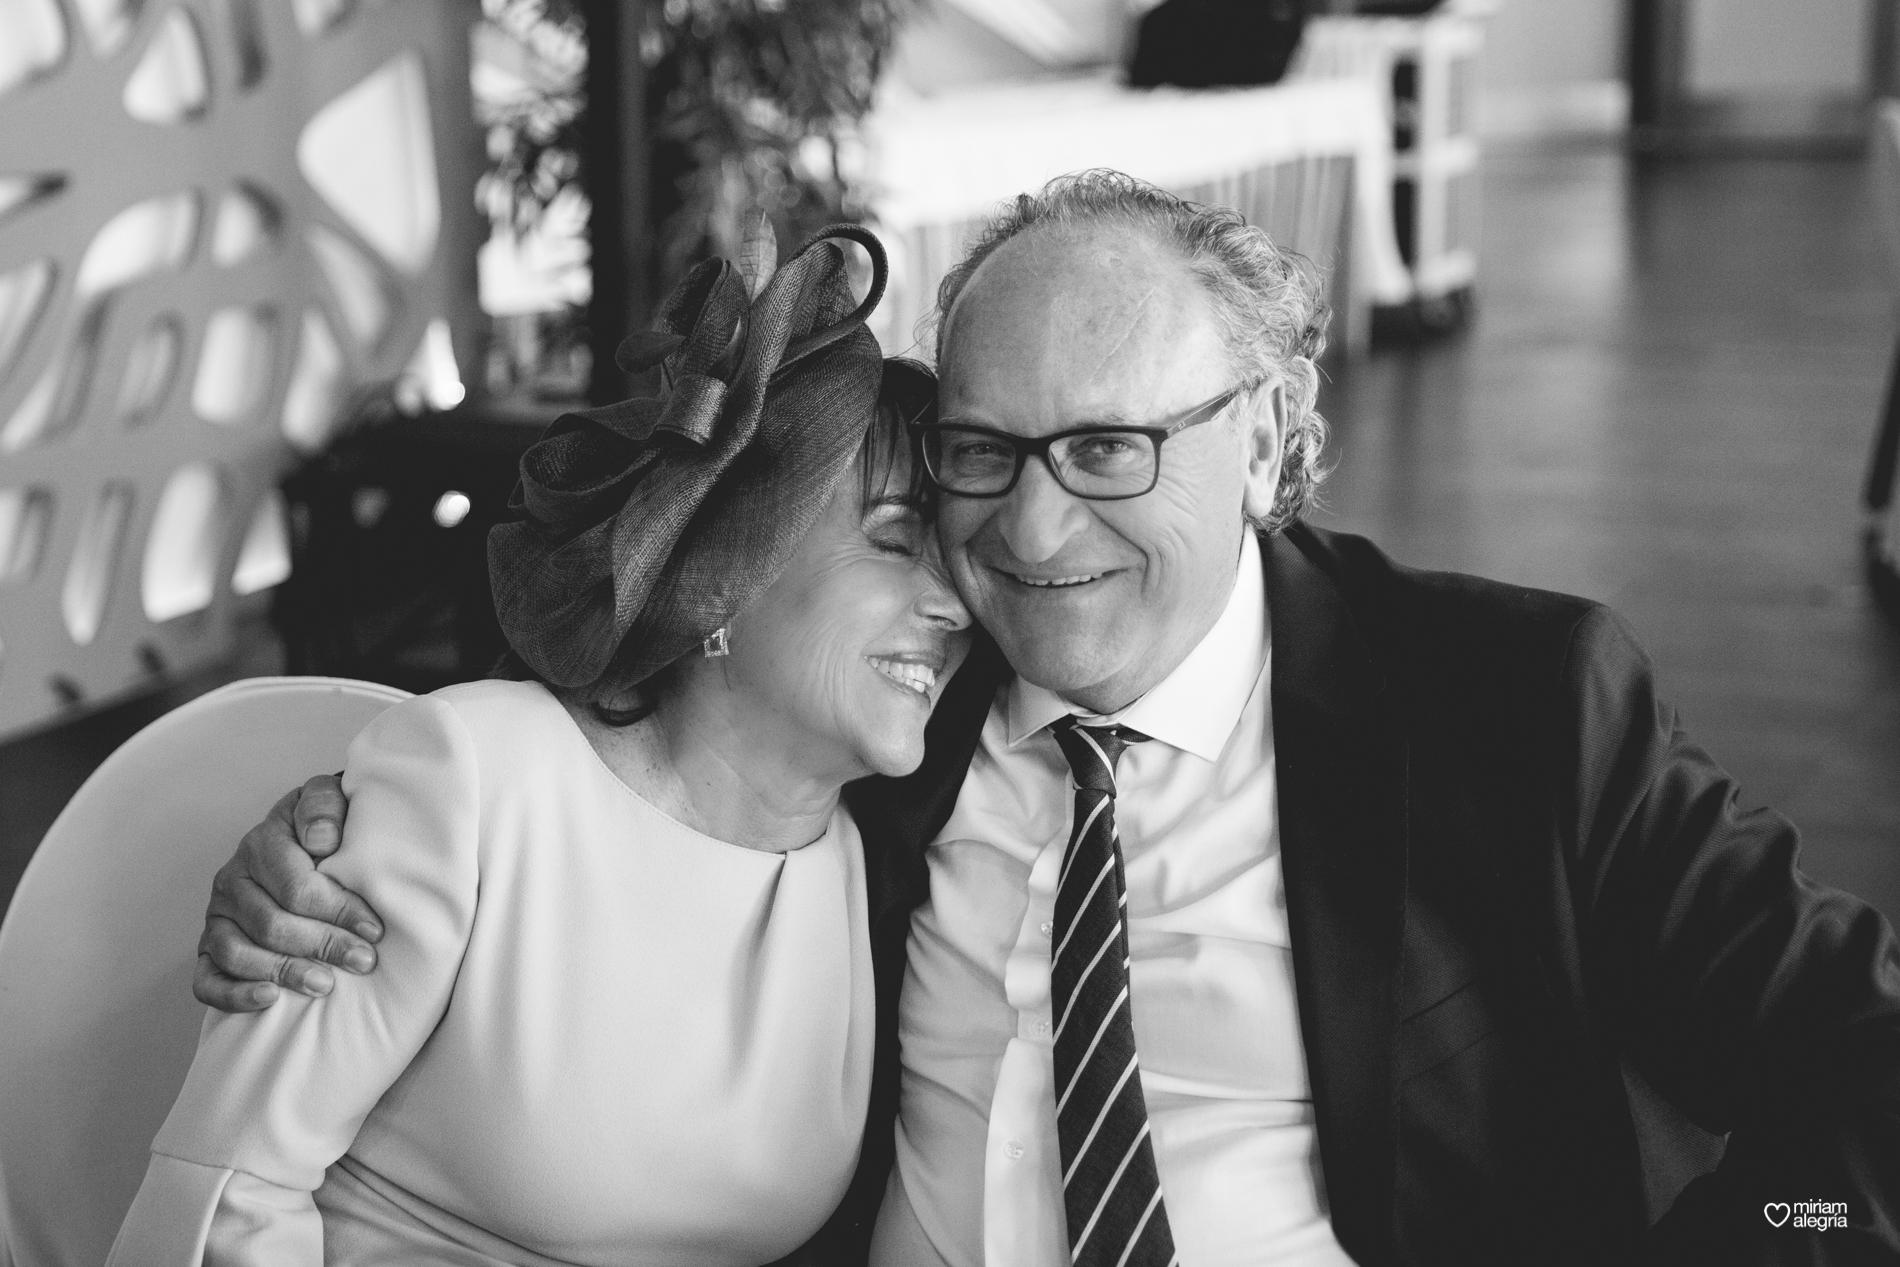 boda-en-la-catedral-de-murcia-miriam-alegria-fotografos-boda-murcia-67